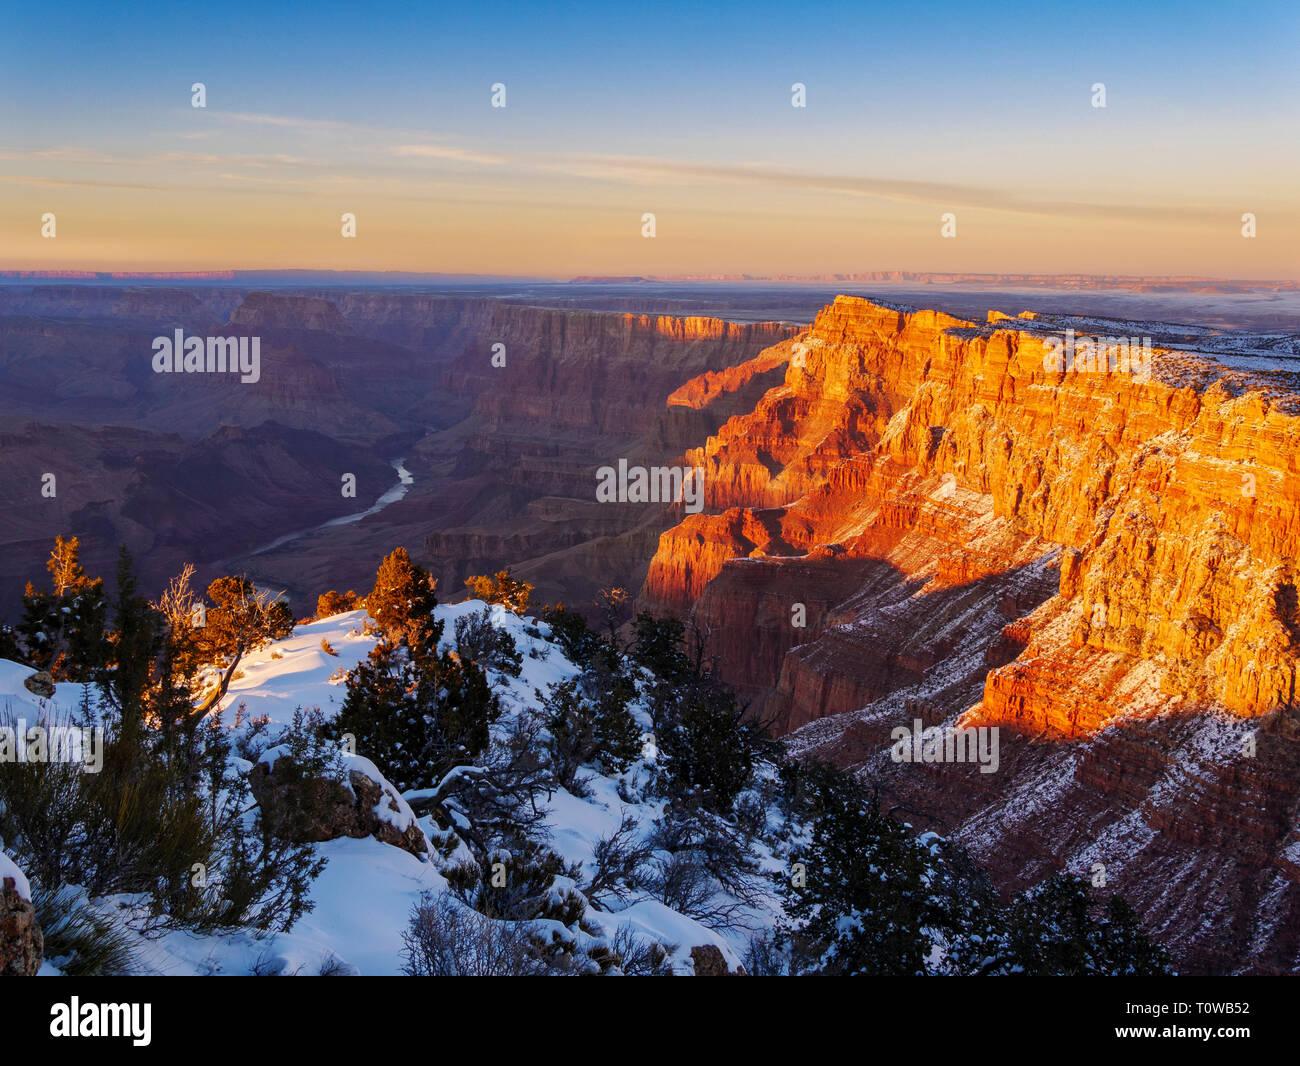 Desert View at Sunset. Grand Canyon National Park, Arizona. Palisades of the Desert at right. Stock Photo